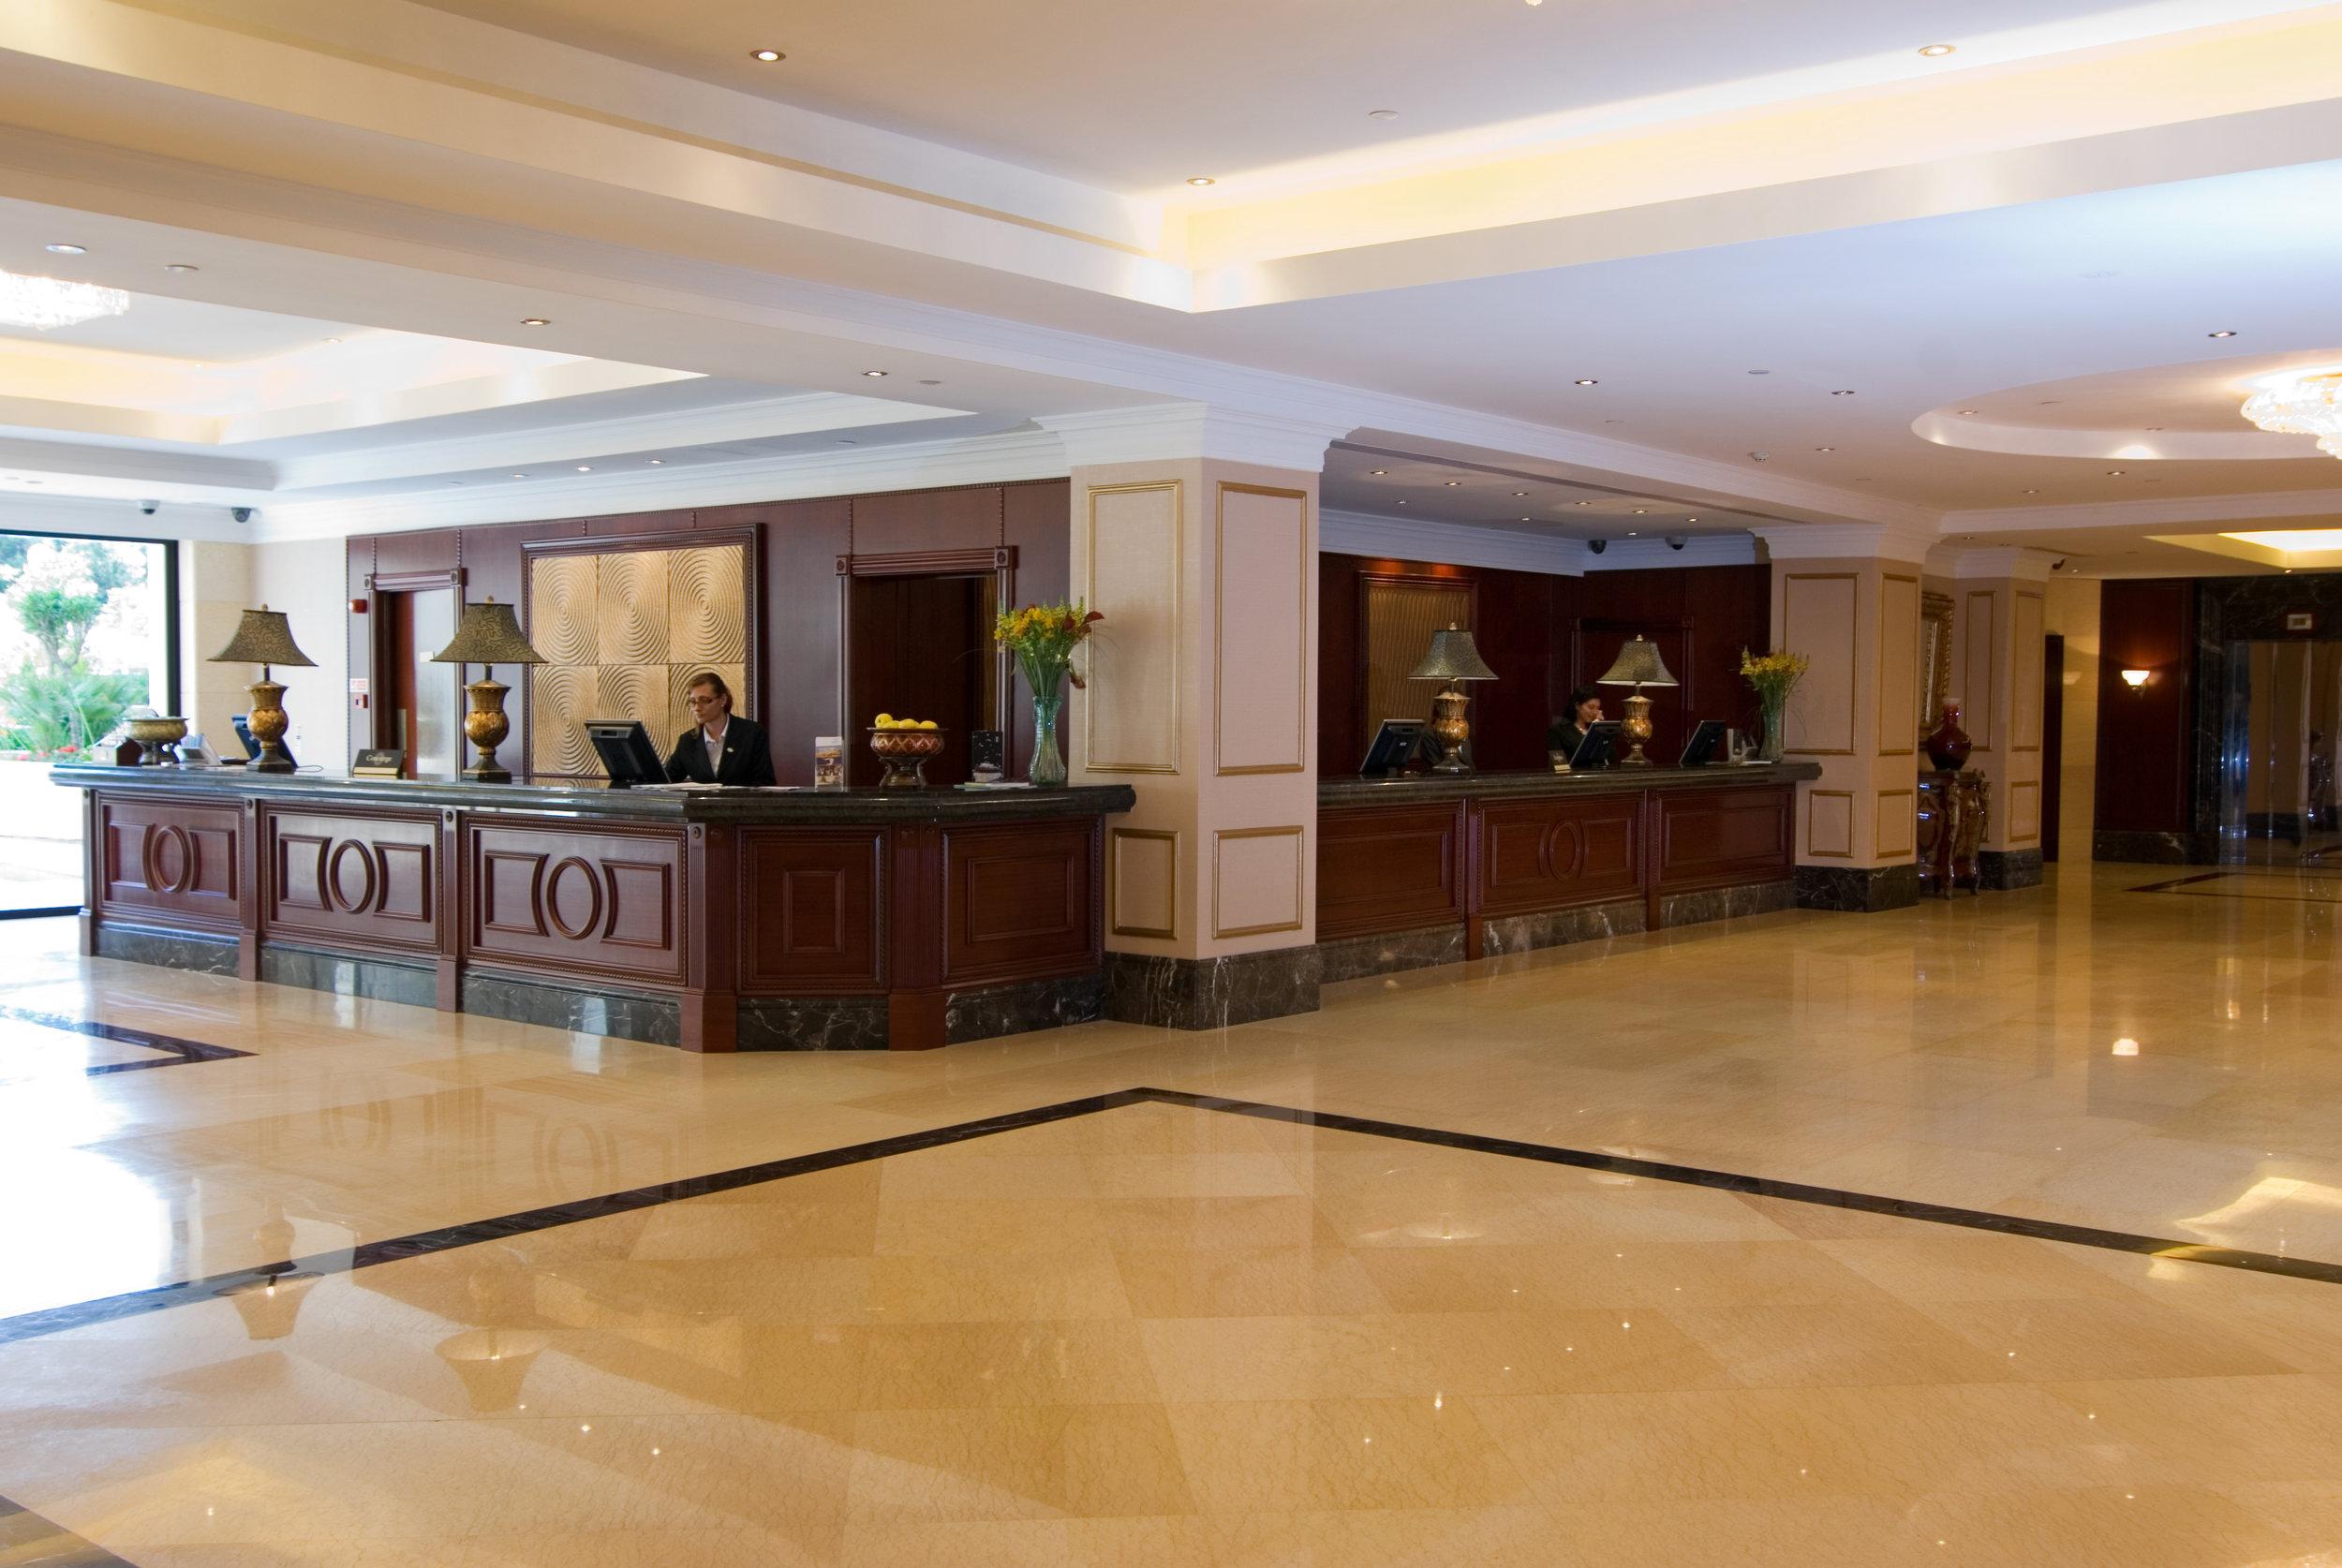 Grand Hotel Excelsior Reception.jpg